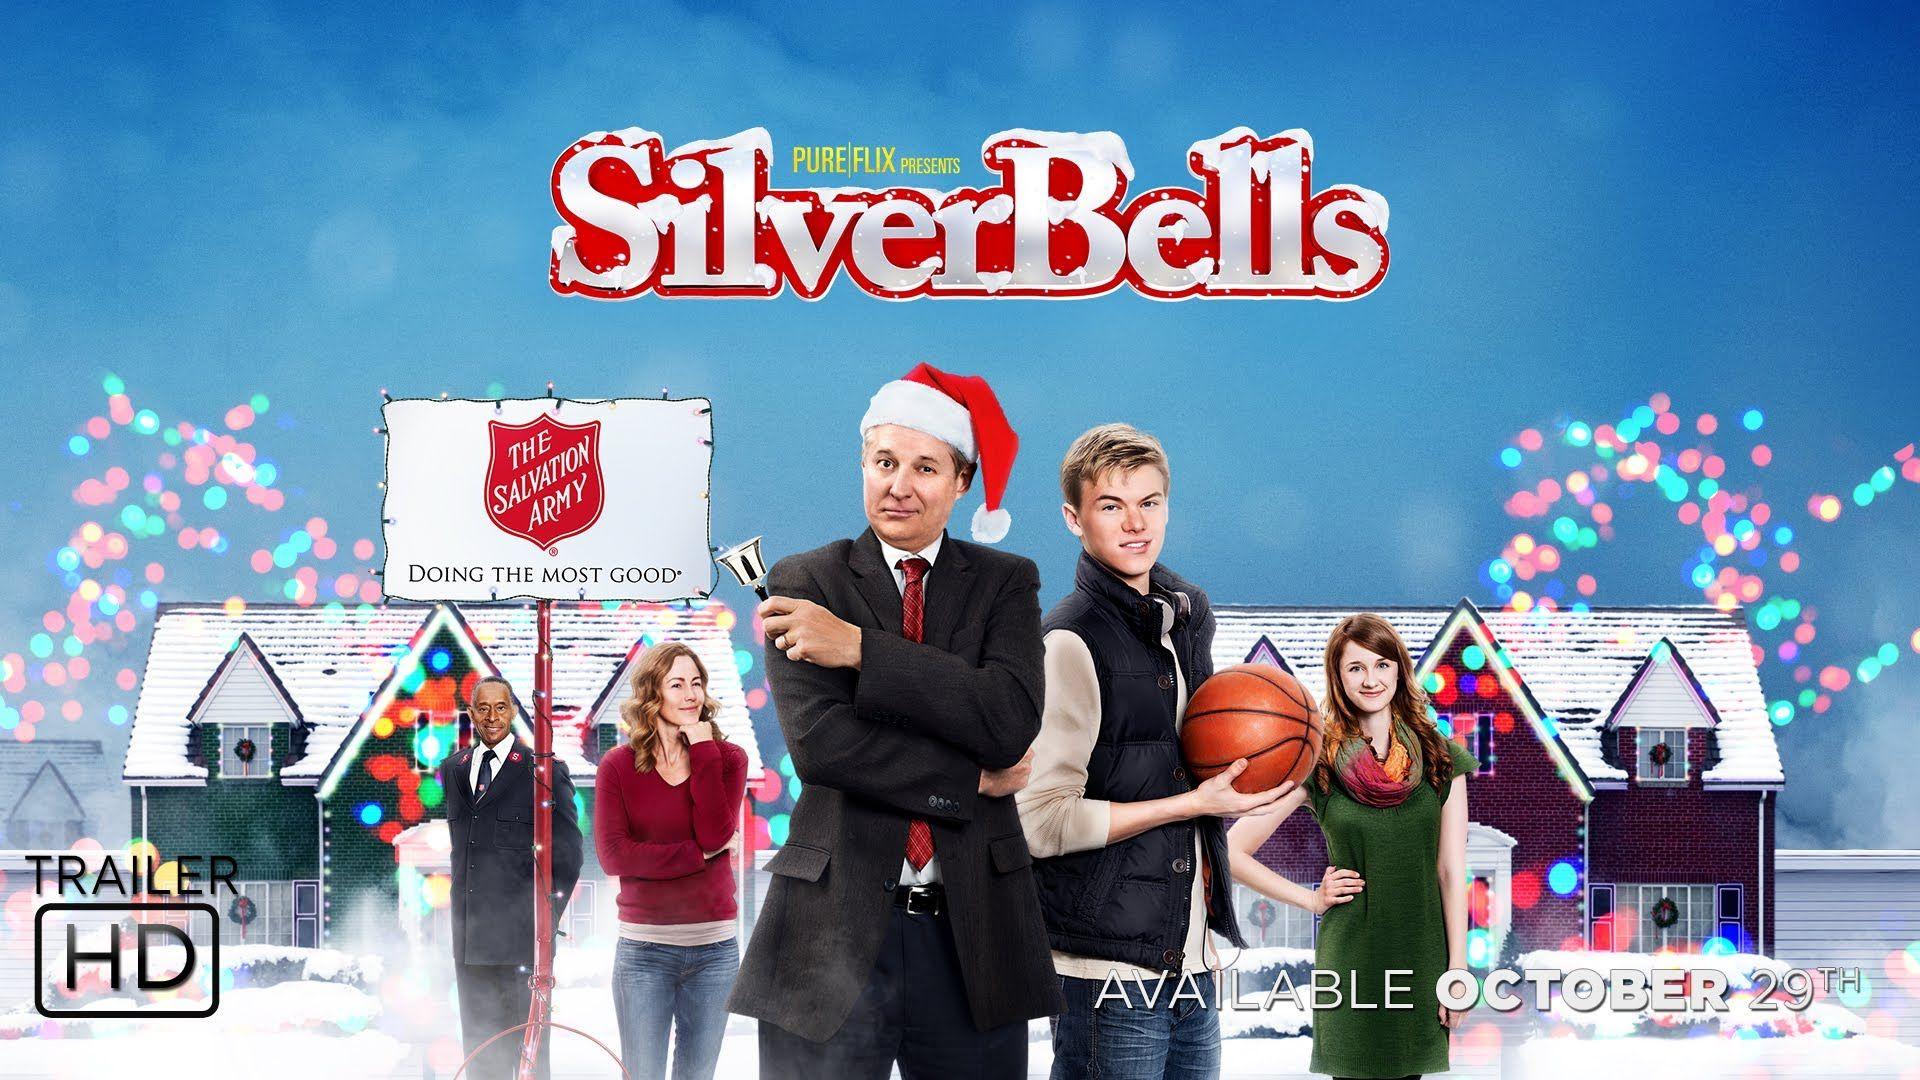 Silver Bells starring Bruce Boxleitner Kenton Duty